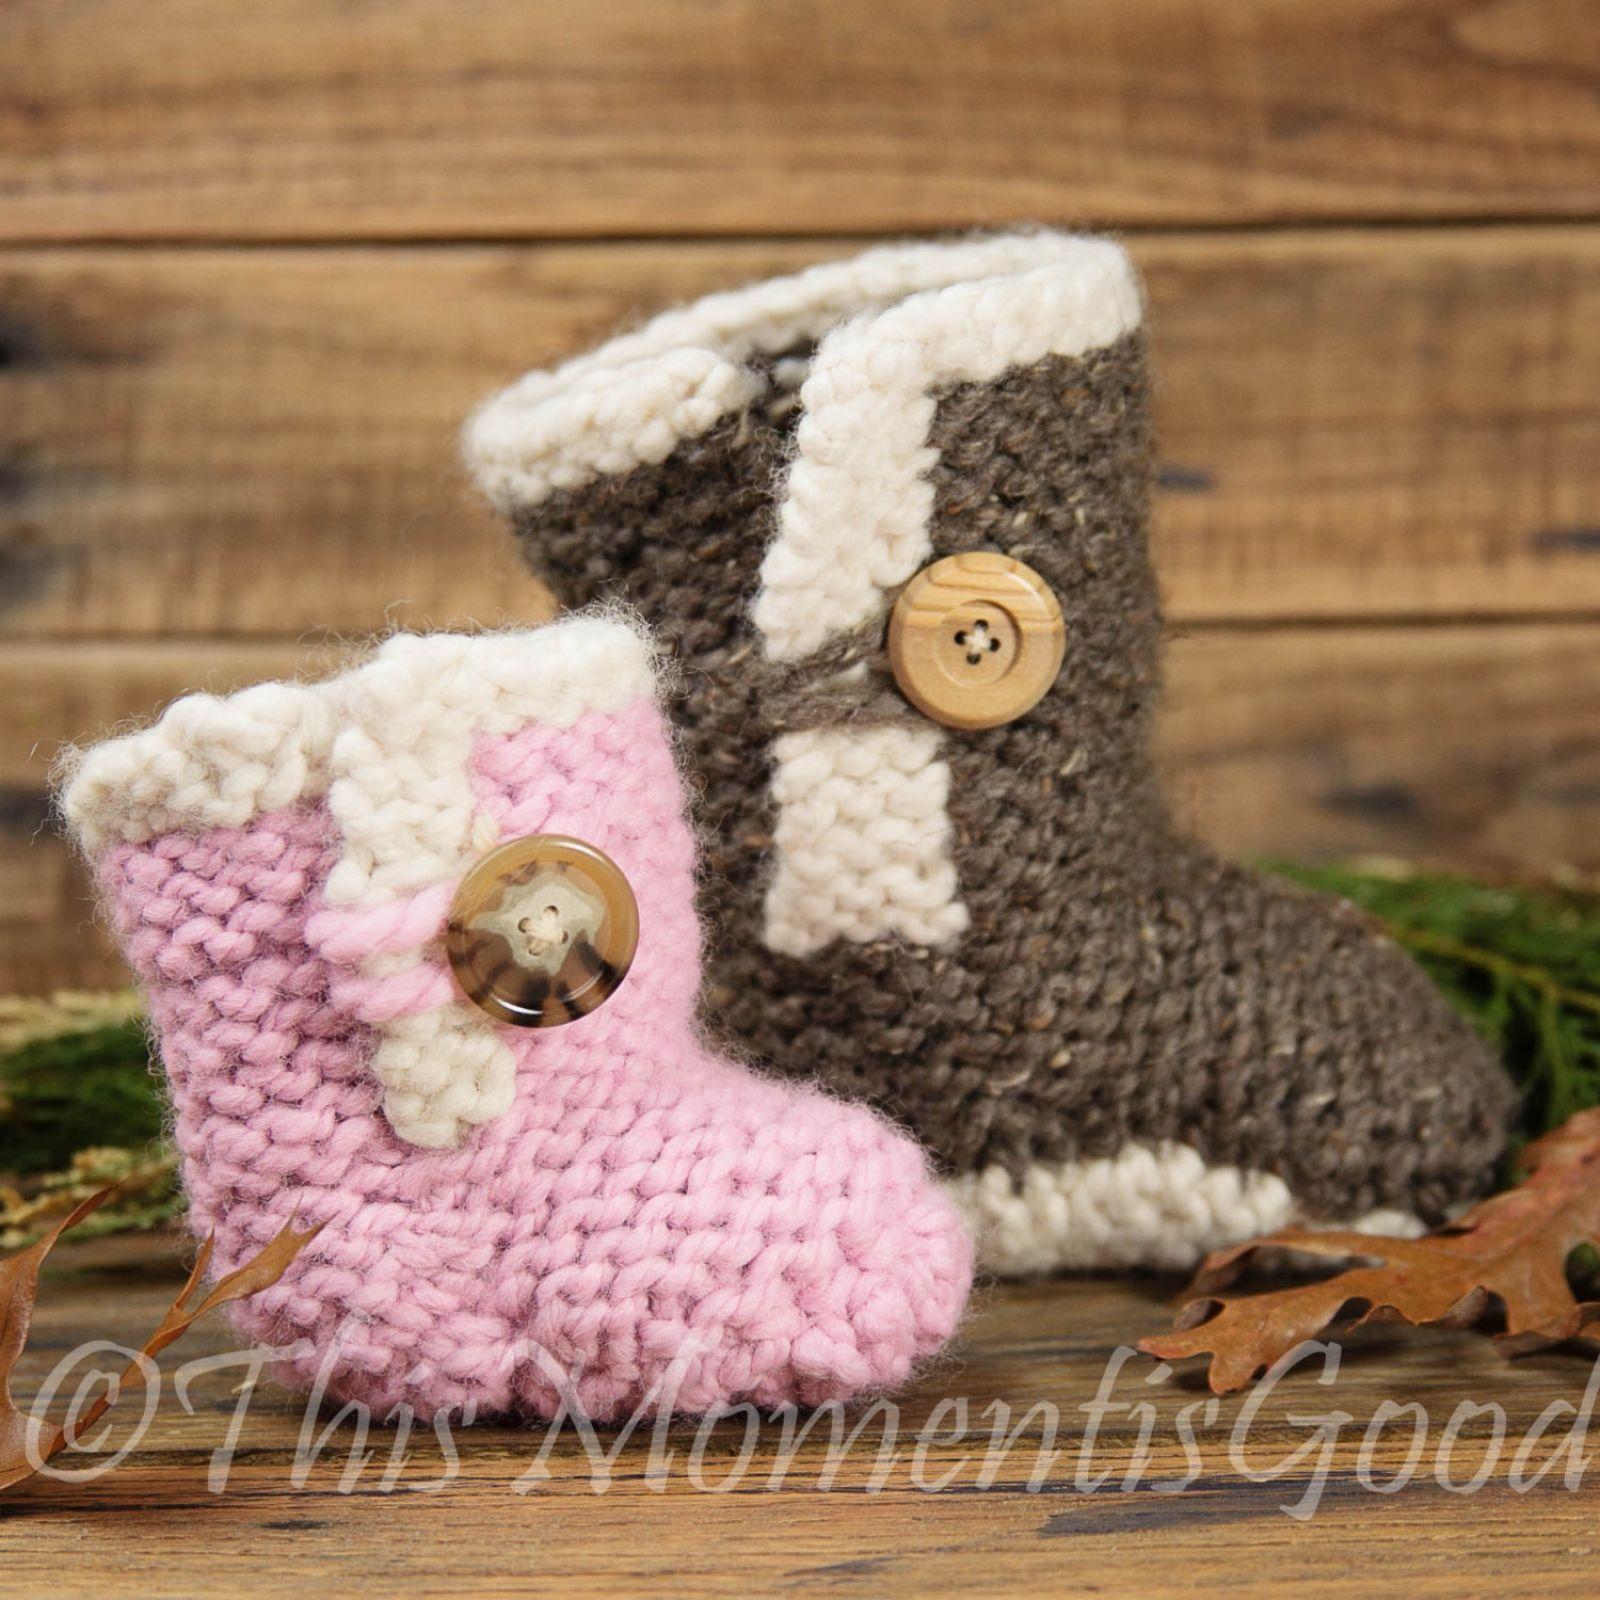 Loom Knit Baby Boots PATTERN! Loom Knit Baby Shoe Pattern in 2 Sizes ...